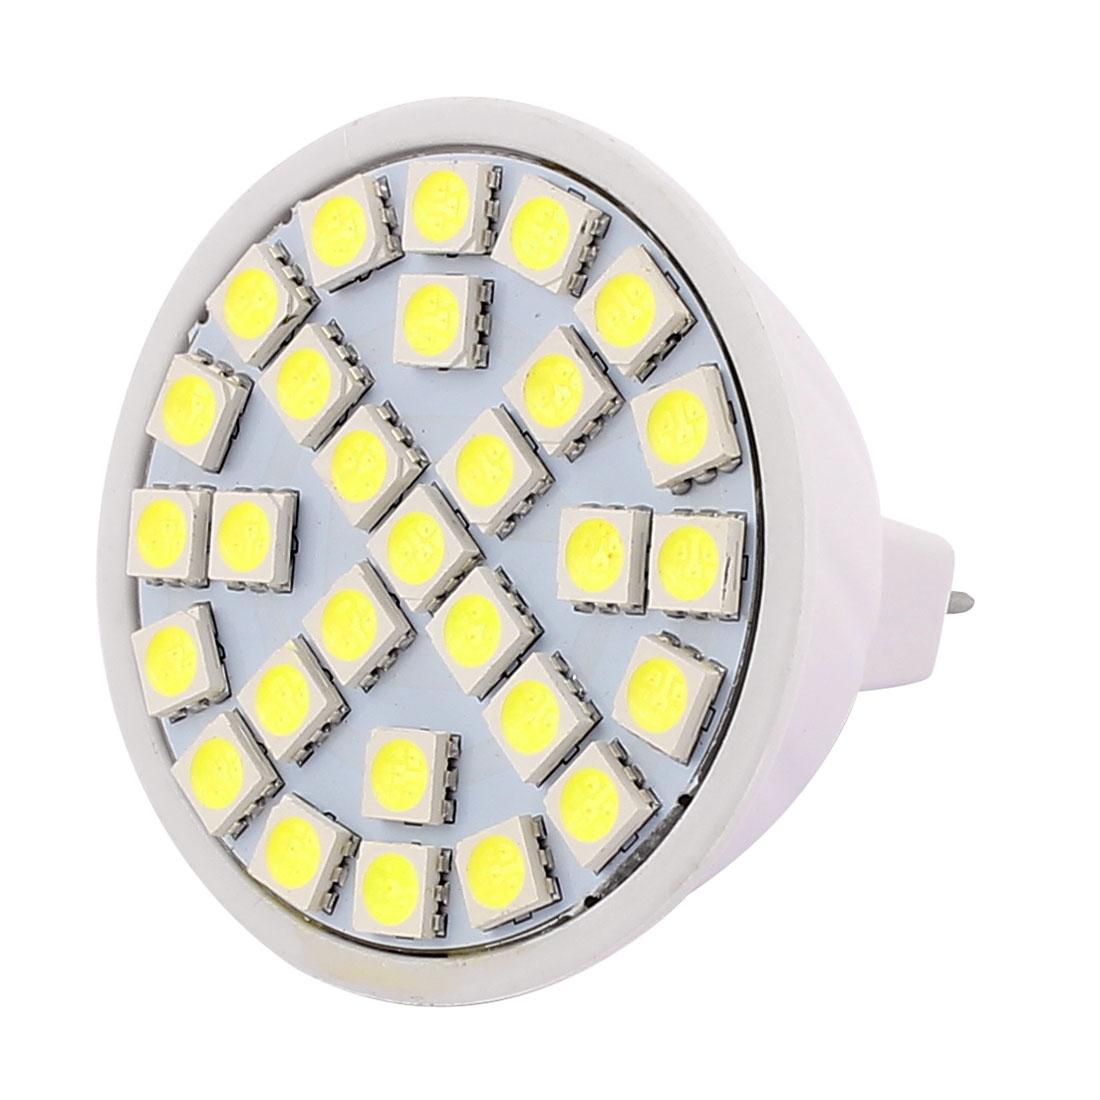 MR16 Smd5050 29LEDs 5W Energy Saving LED Spot Light Lamp Bulb AC 220V White